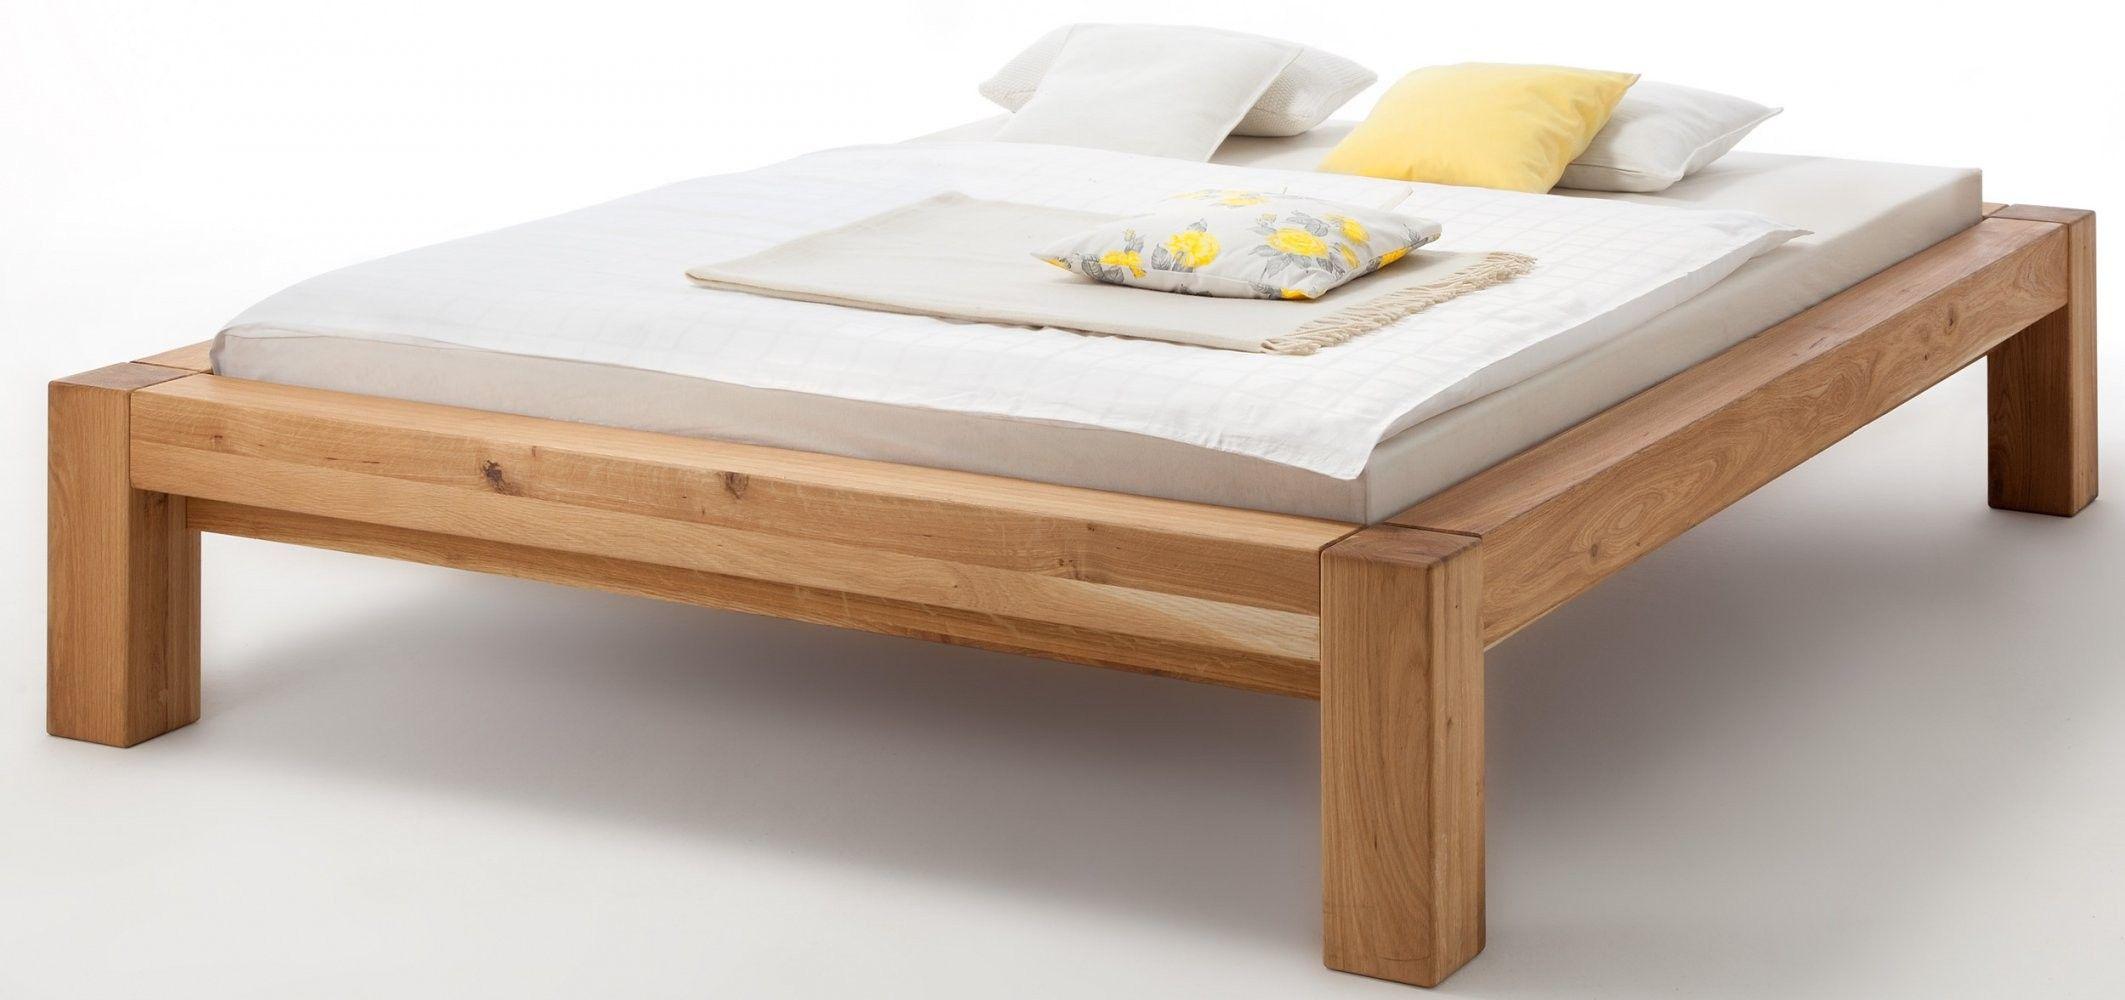 Bettgestell 140x200 Holz Beste Bett Massiv Massivholzbett Buche Von Bettgestell 160x200 Holz In 2020 Big Sofa Mit Schlaffunktion Bett Massivholz Bettgestell